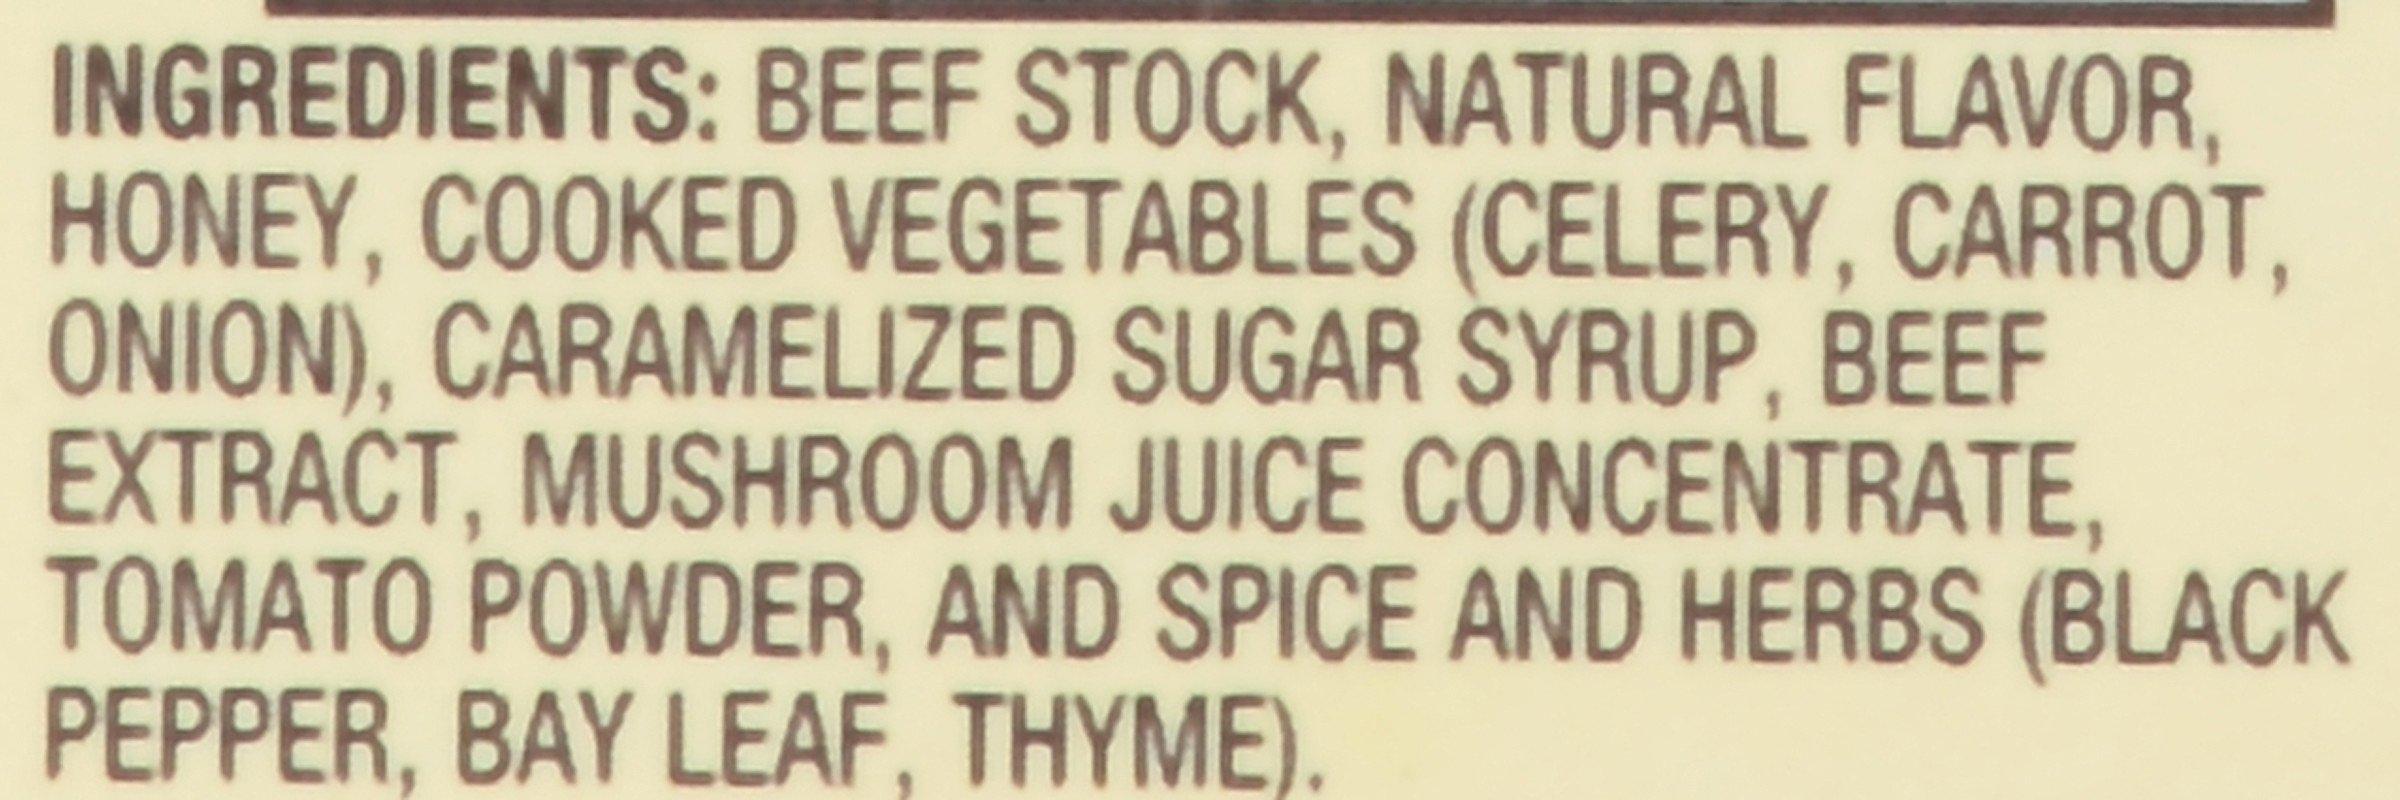 Kitchen Basics All Natural Unsalted Beef Stock, 32 fl oz by Kitchen Basics (Image #3)